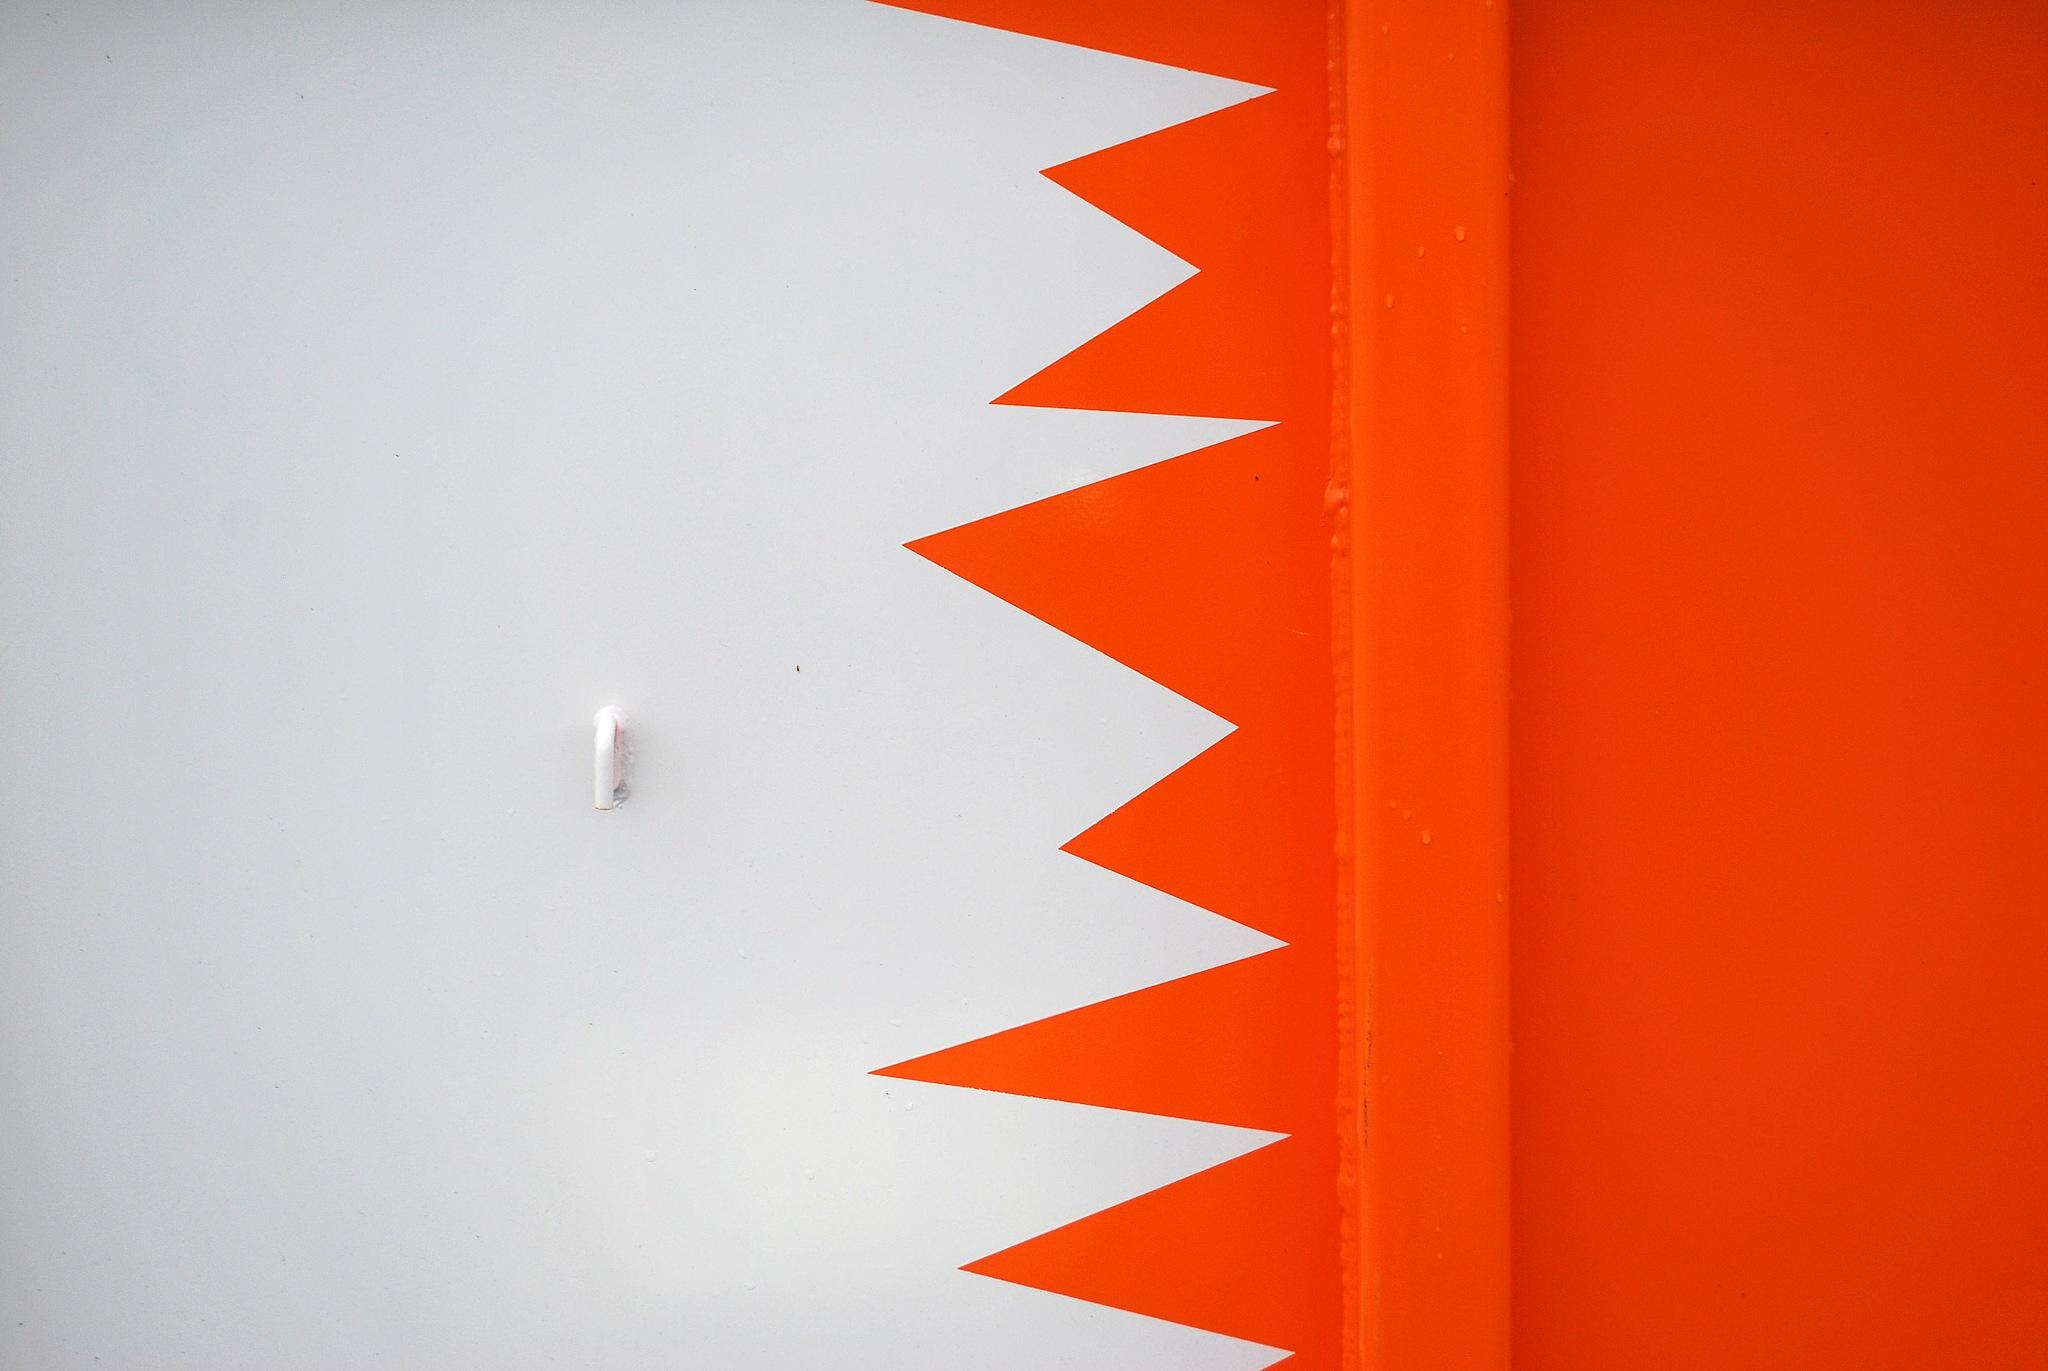 Orange Zickzack by liwesta